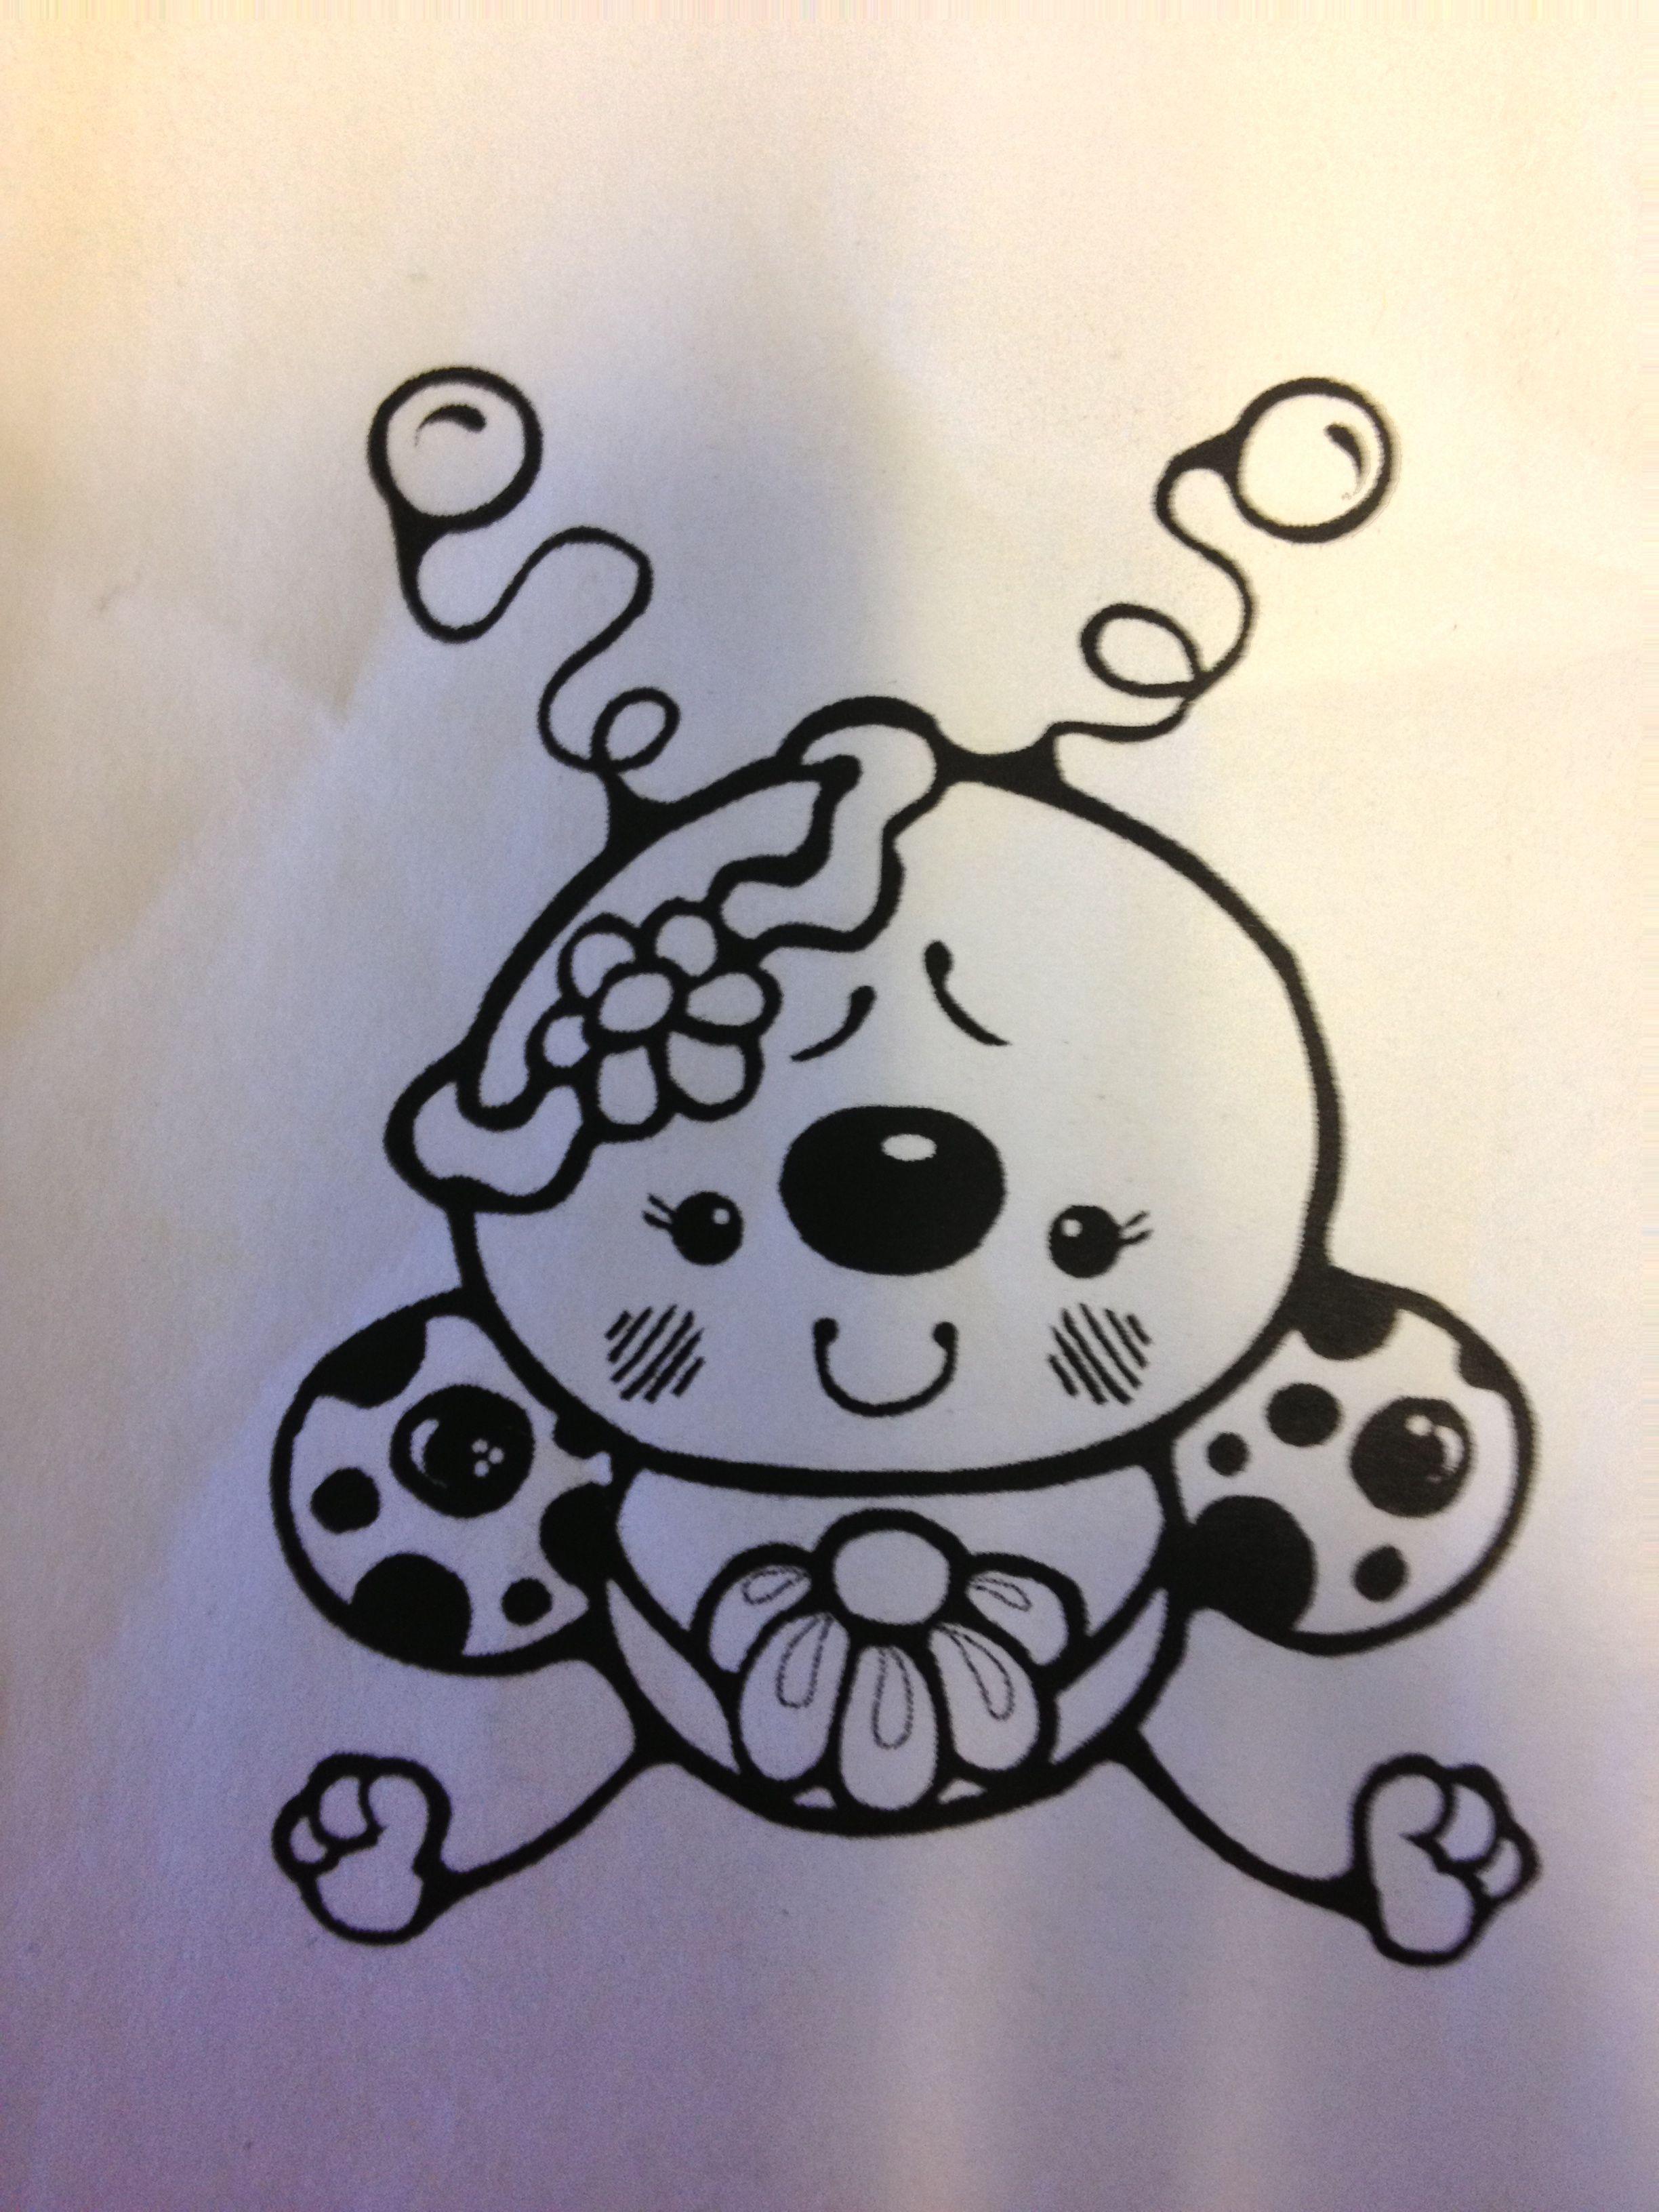 The template for my ladybug tattoo tattoos pinterest ladybug